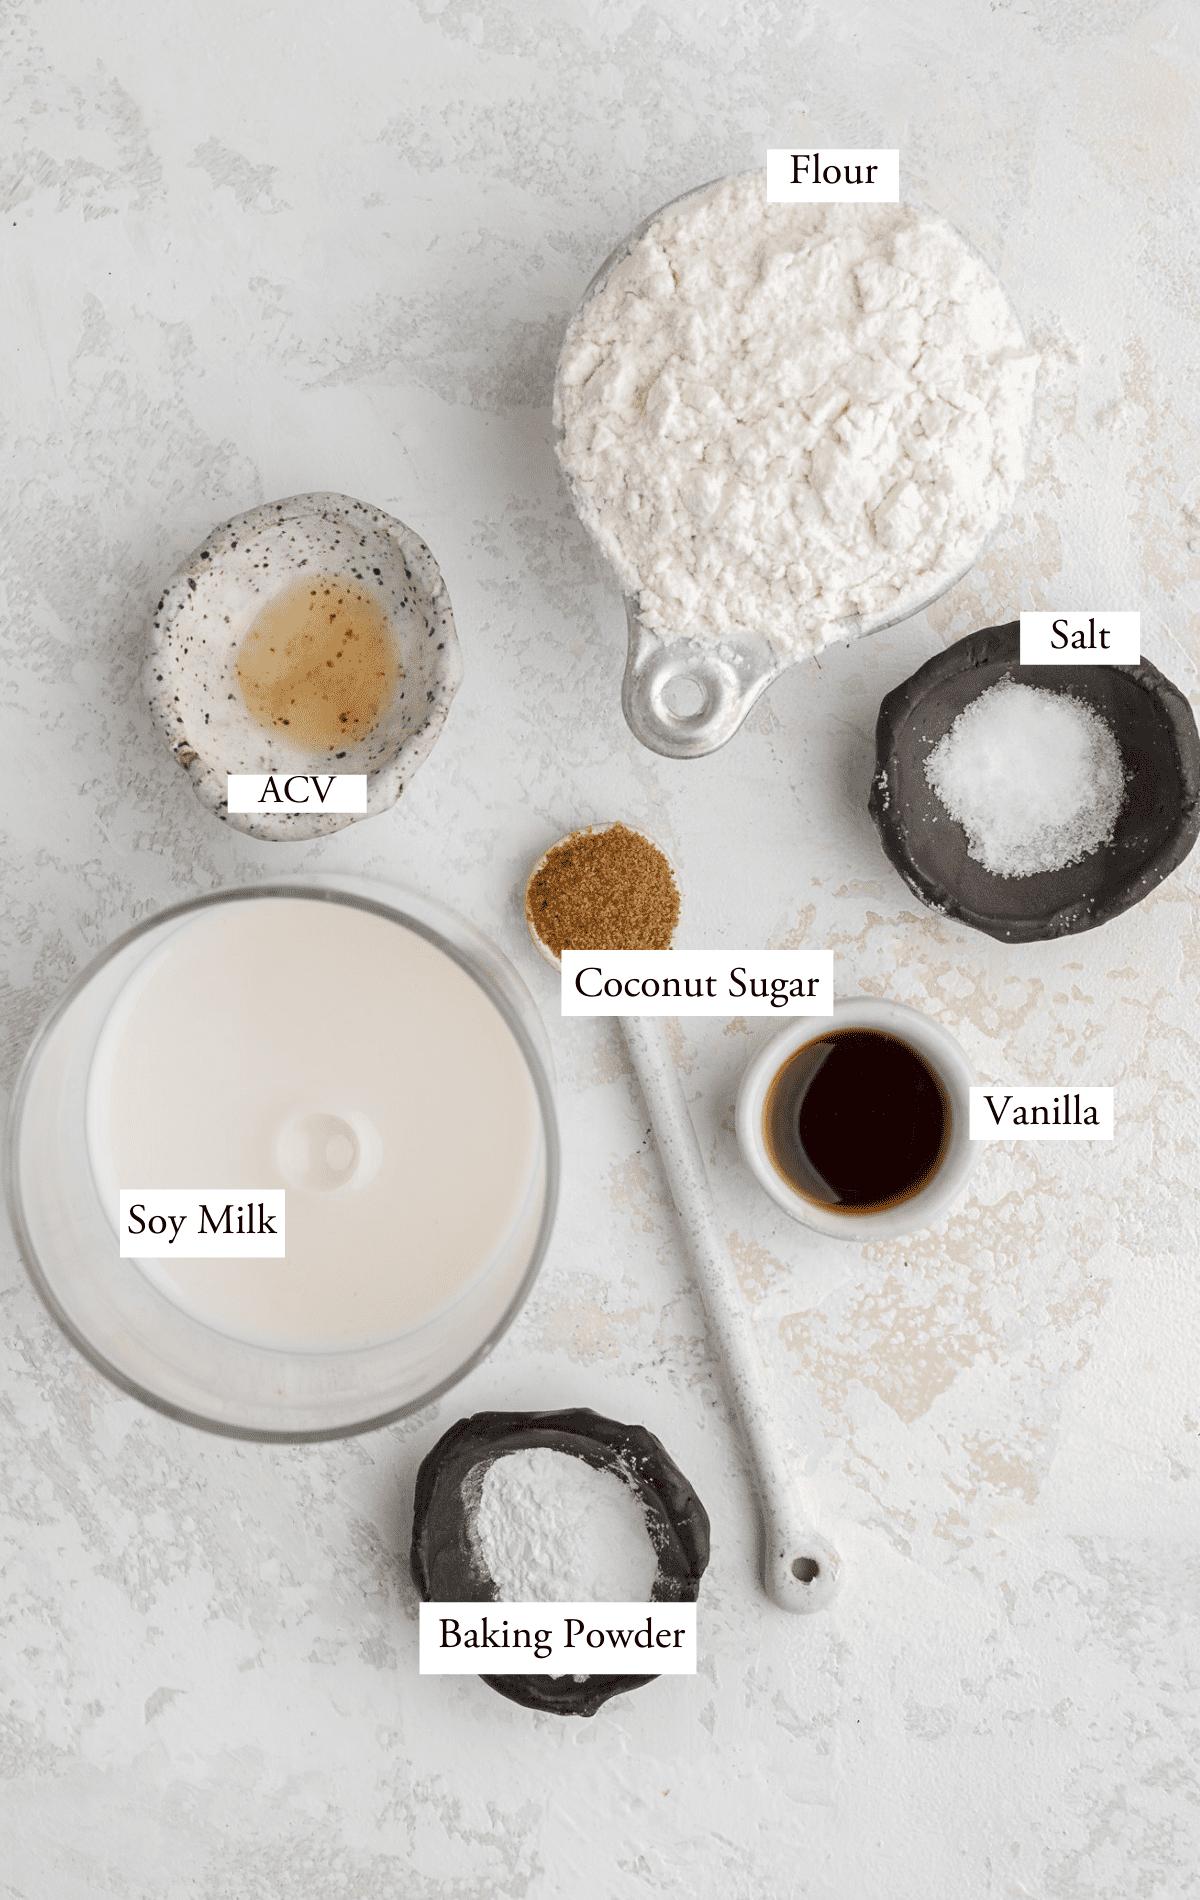 Vegan buttermilk pancake ingredients: milk, ACV, flour, baking powder, coconut sugar, vanilla, salt